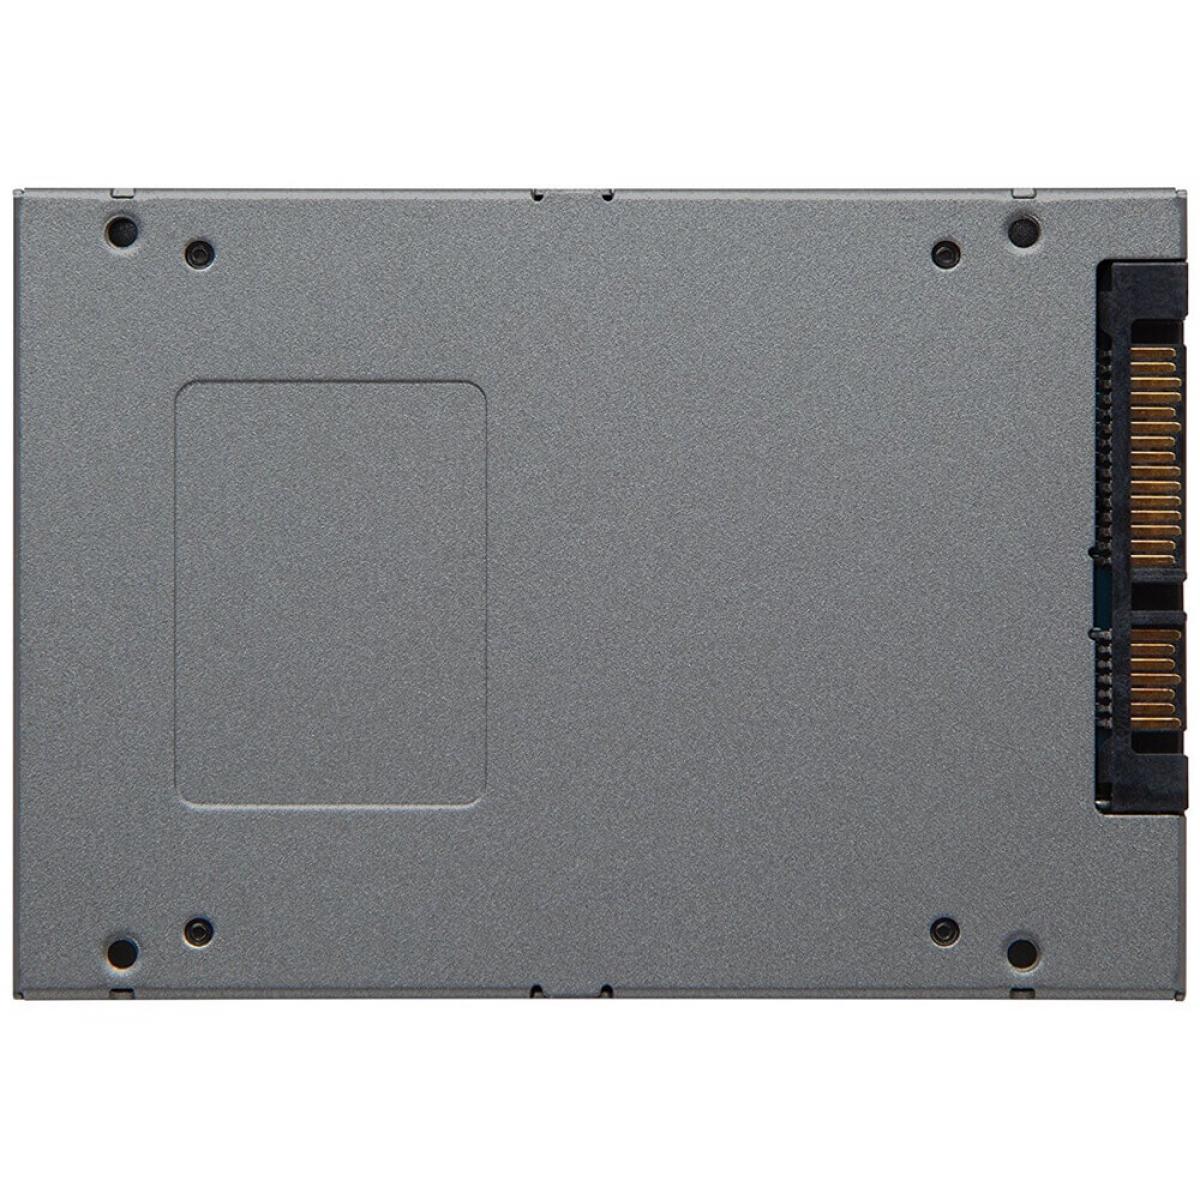 SSD Kingston UV500, 120GB, SATA III, Leitura 520MBs e Gravação 320MBs, SUV500-120G